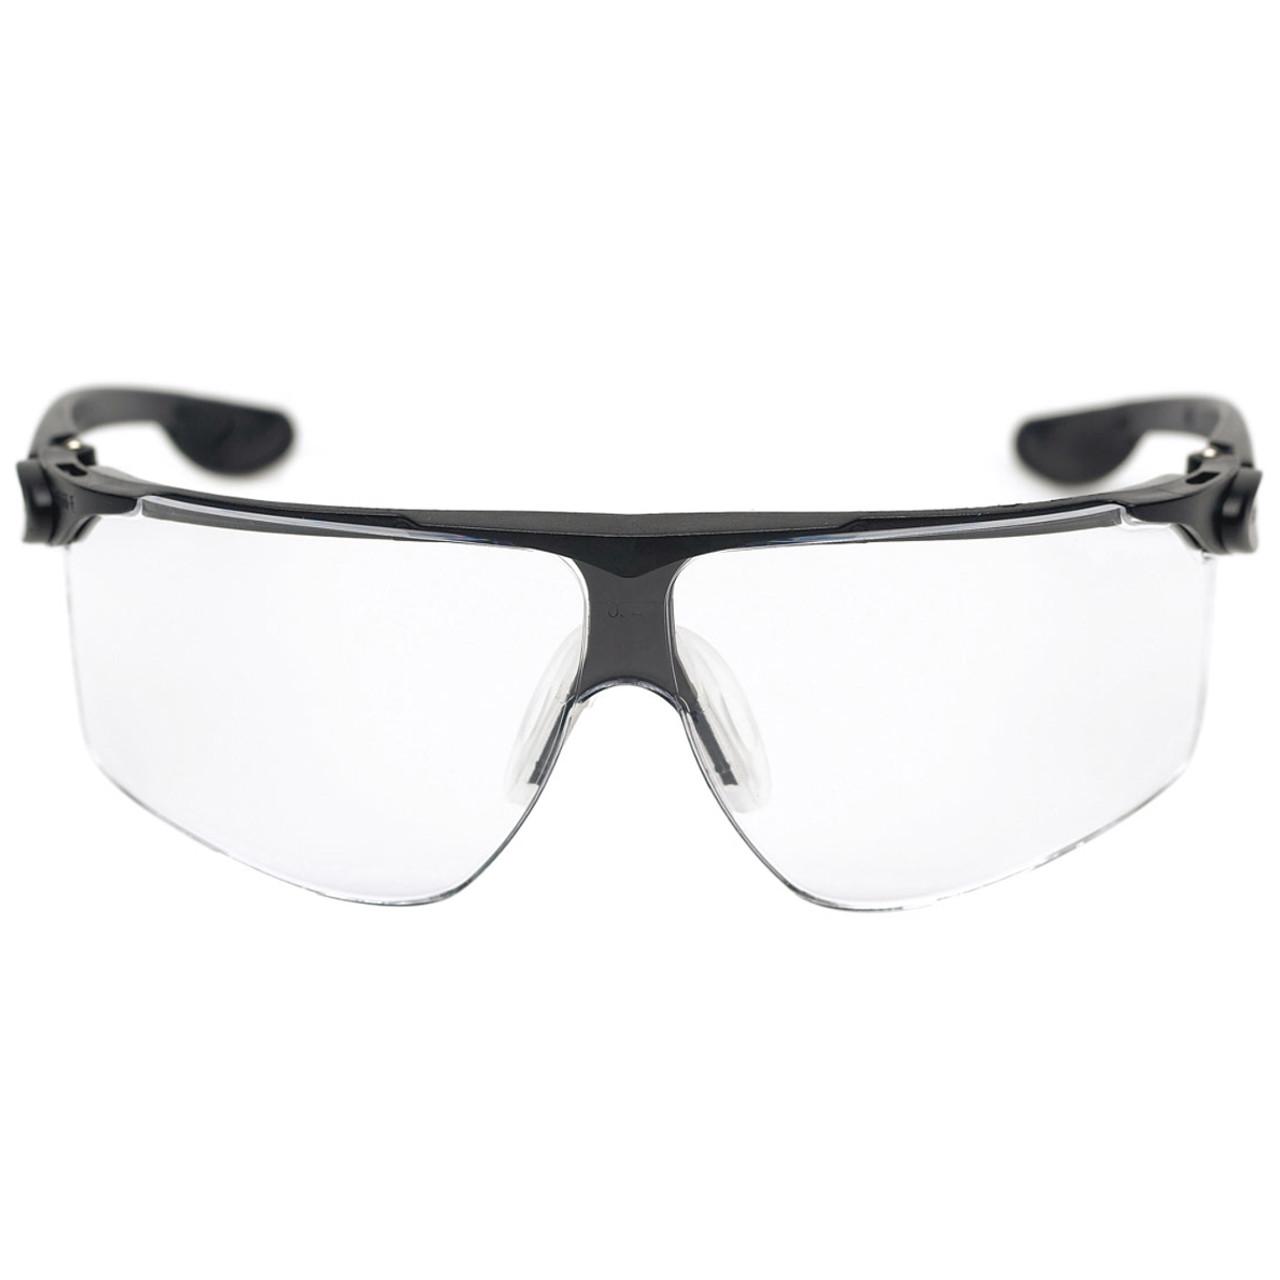 3M Peltor Schießbrille Maxim Ballistic